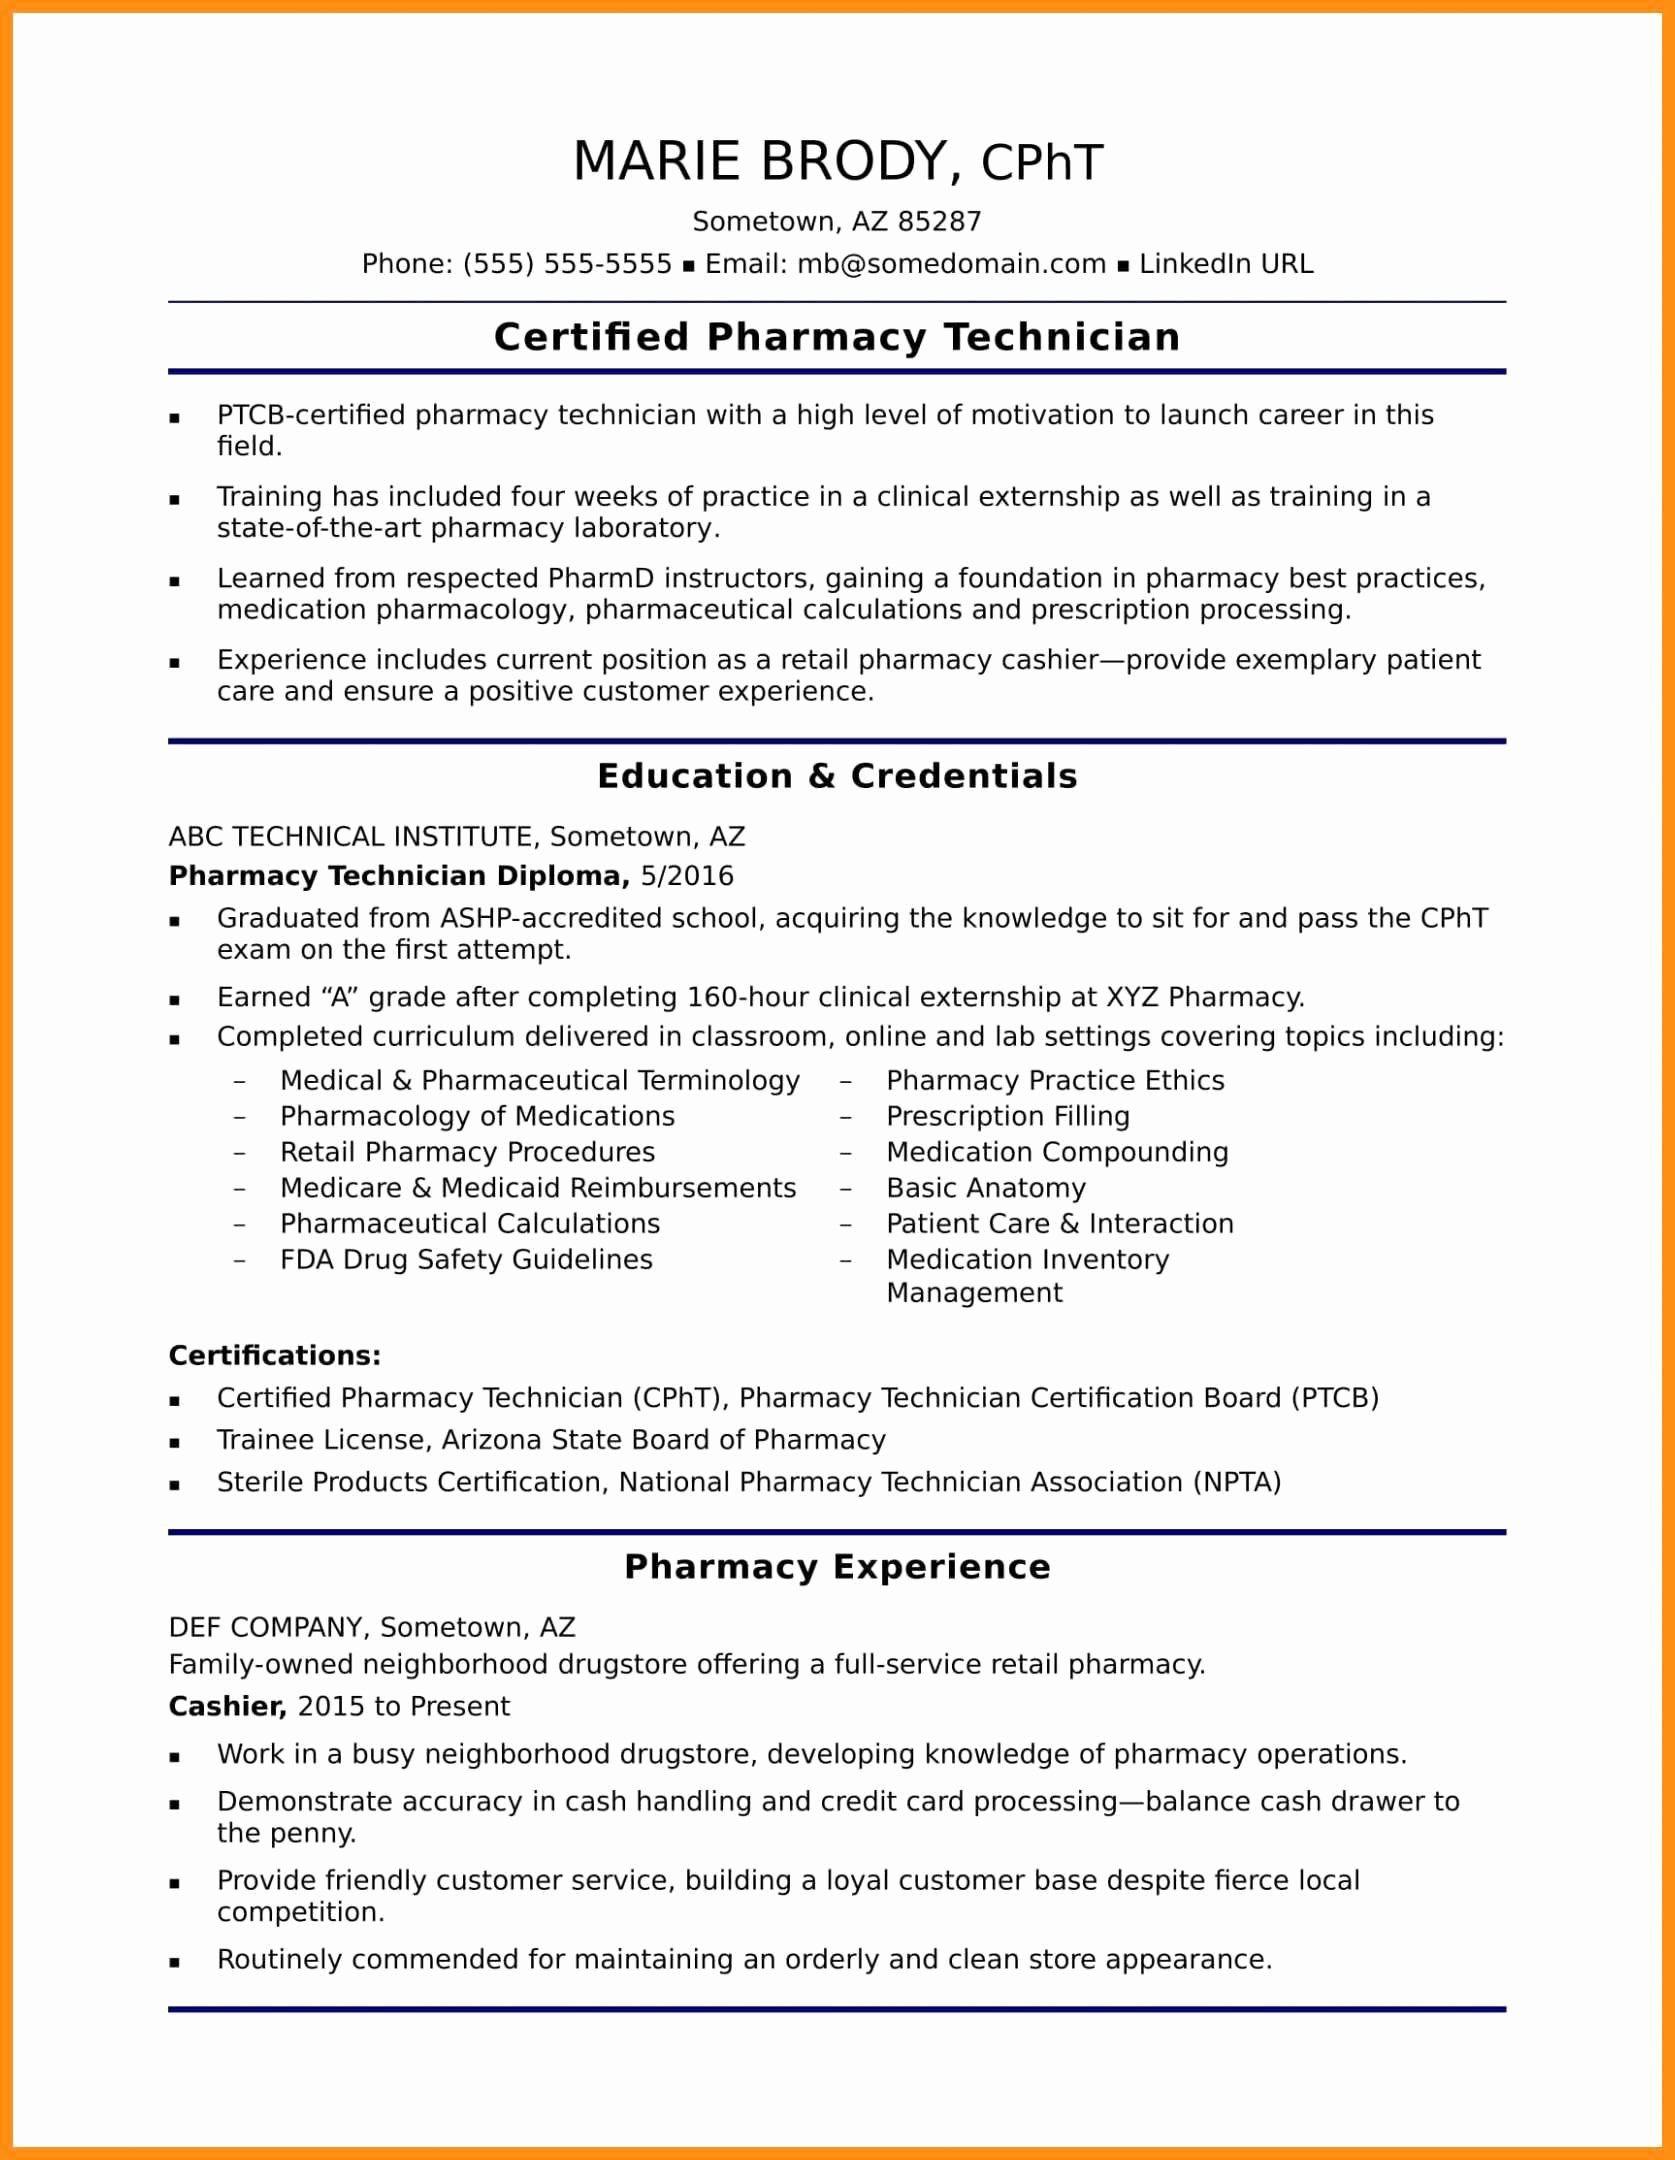 H1b Premium Processing Resume Lovely Intern Resume Example Best Pharmacist Resume Template Best Resume Template Resume Good Resume Examples